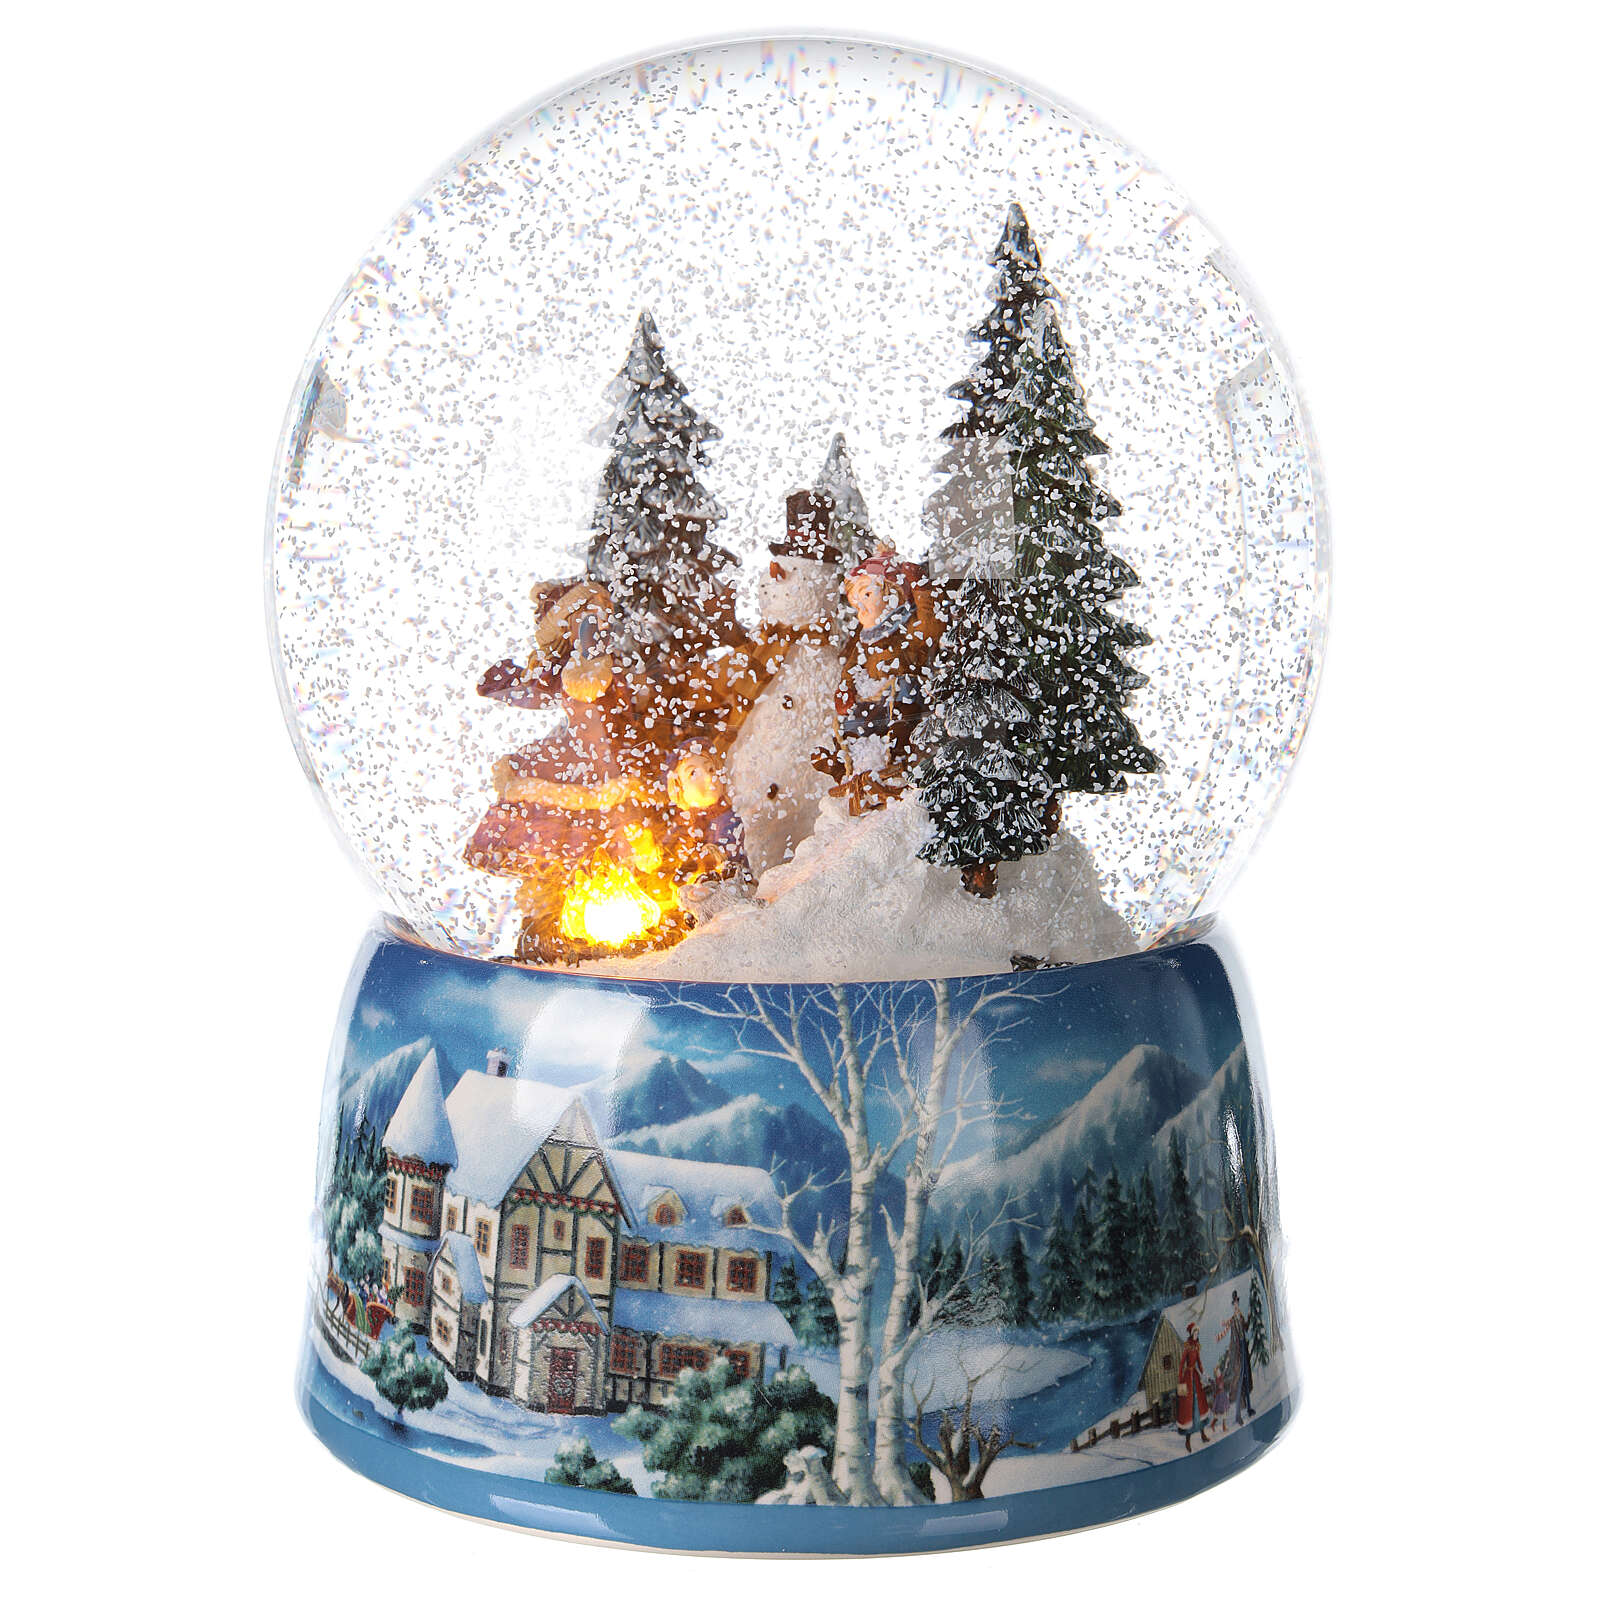 Christmas snow globe snowman children music 20x15x15 cm 3